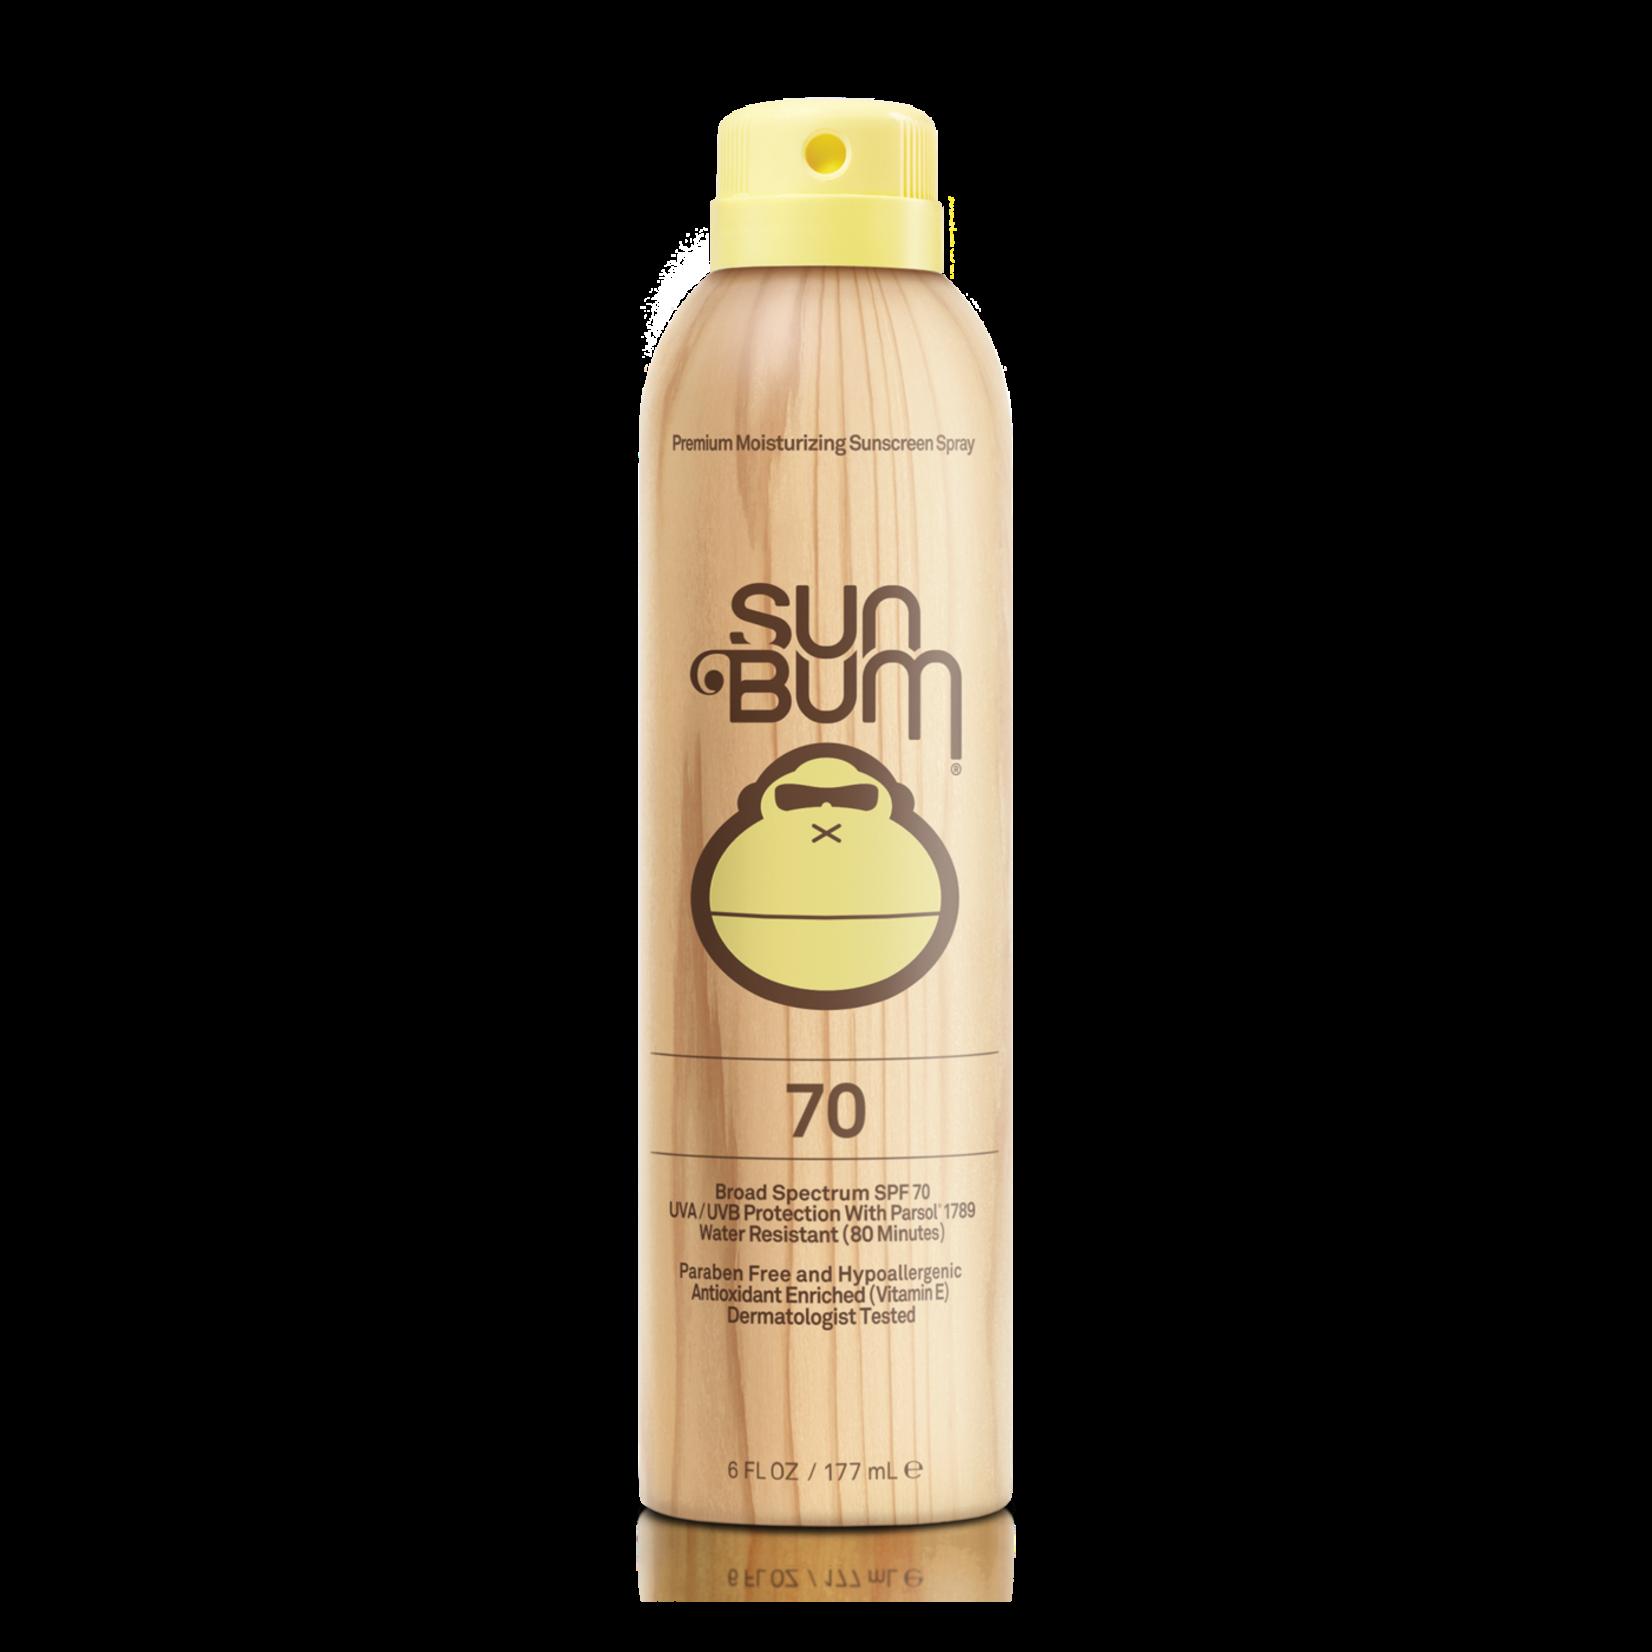 Sun Bum Sun Bum Original Sunscreen Spray